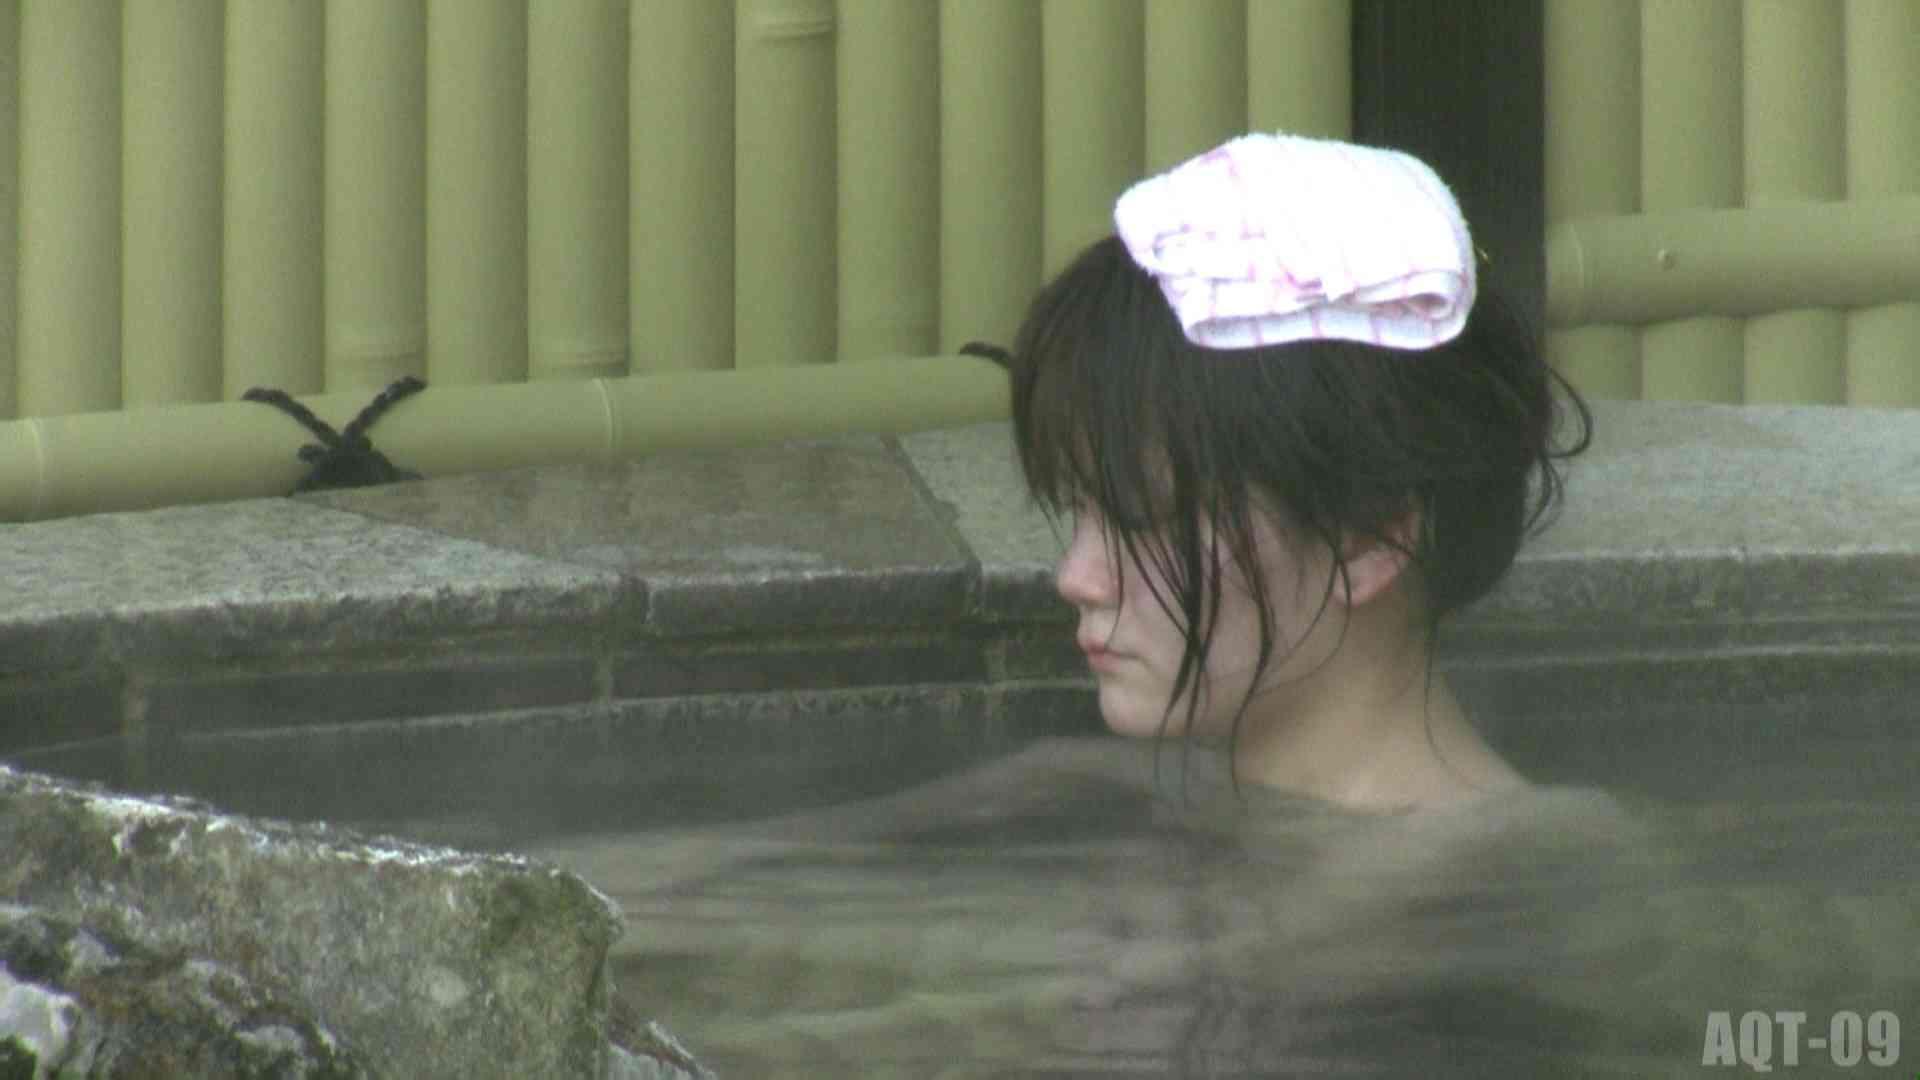 Aquaな露天風呂Vol.789 盗撮映像  51Pix 32